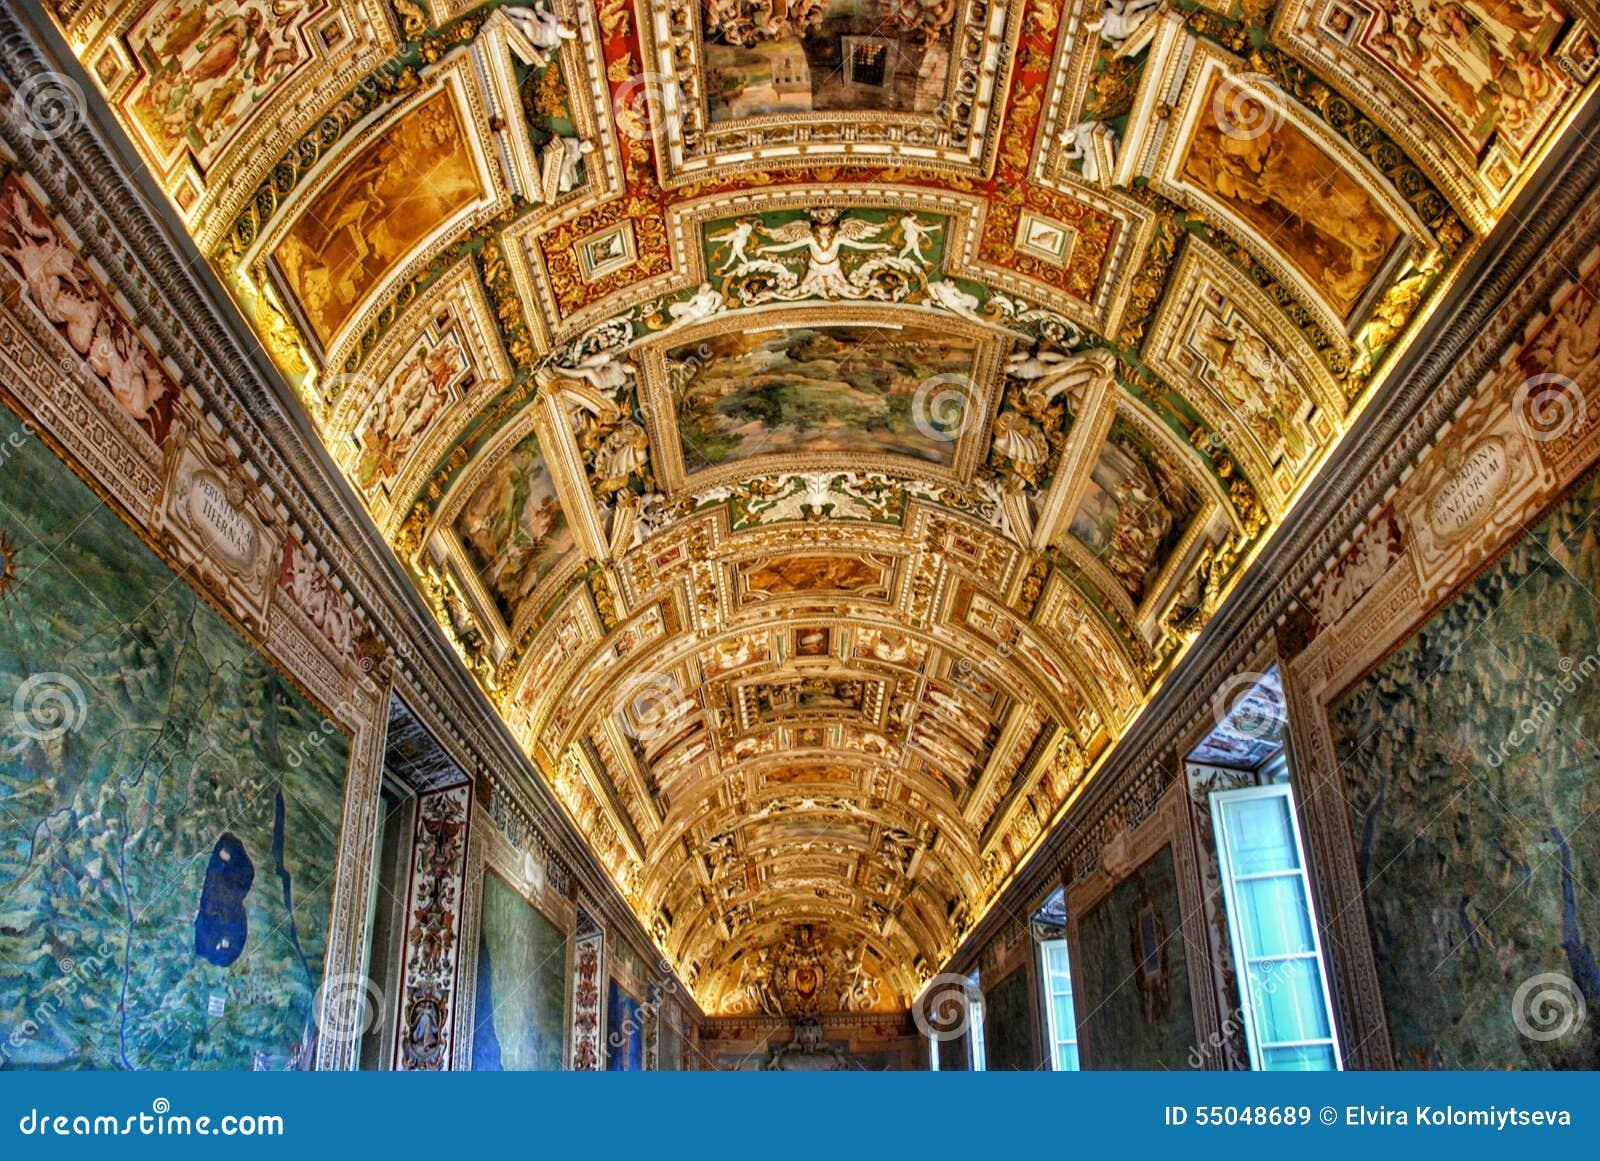 Plafond De Mus 233 E De Vatican Photo Stock Image 55048689 border=